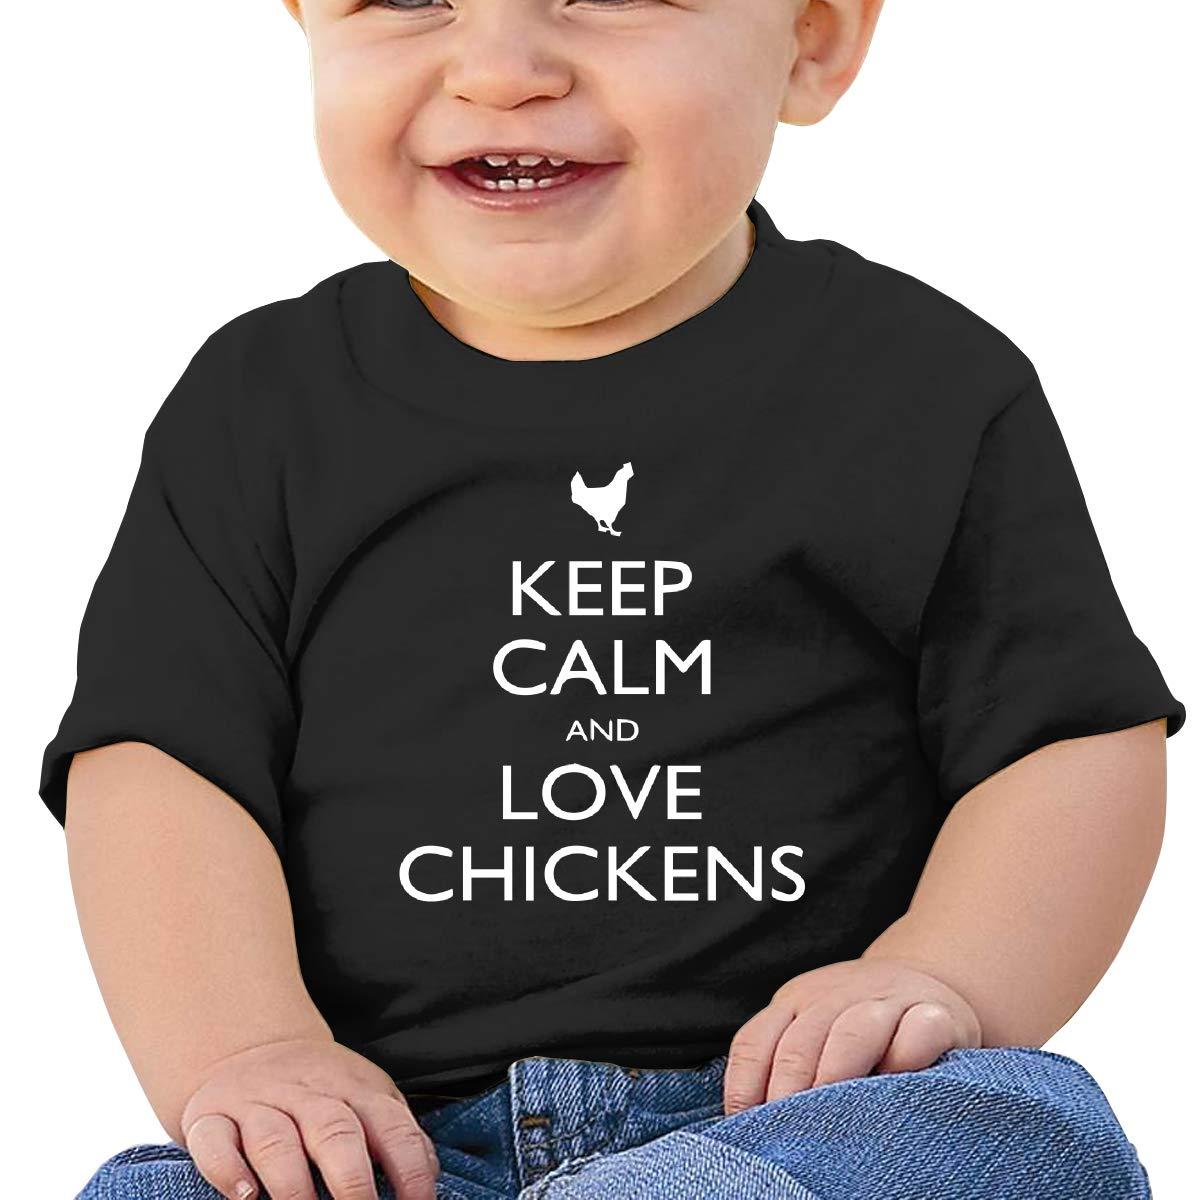 Love Chickens Newborn Baby Newborn Short Sleeve T Shirts 6-24 Month Soft Tops